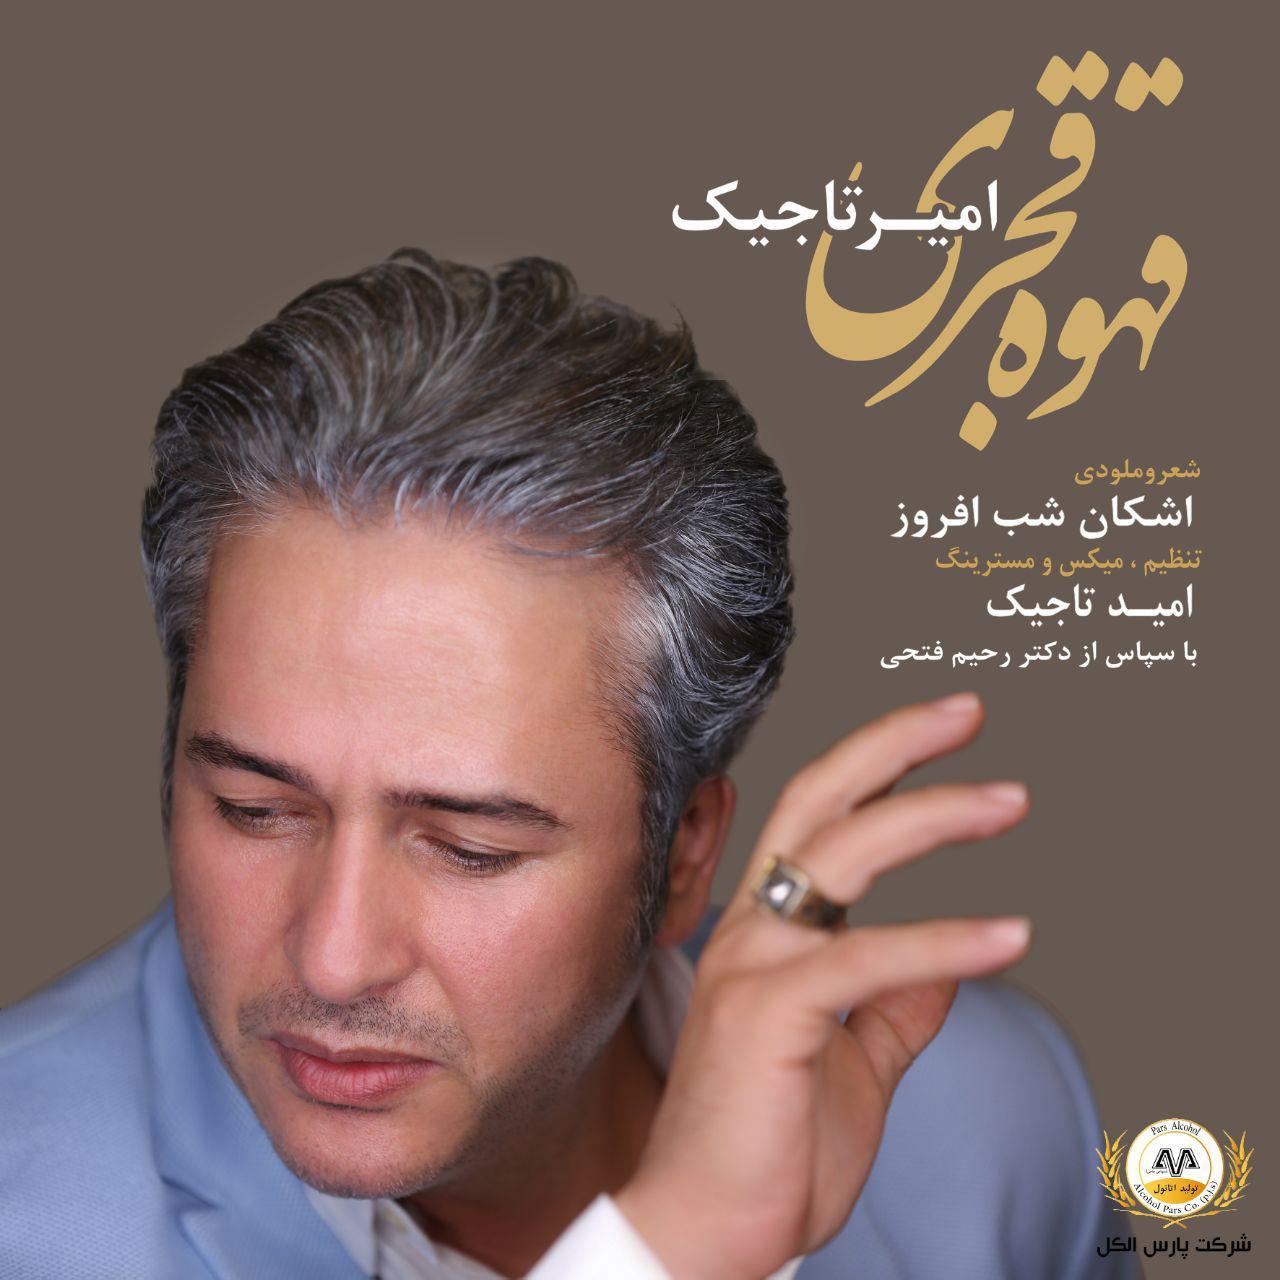 Download Ahang امیر تاجیک قهوه قجری